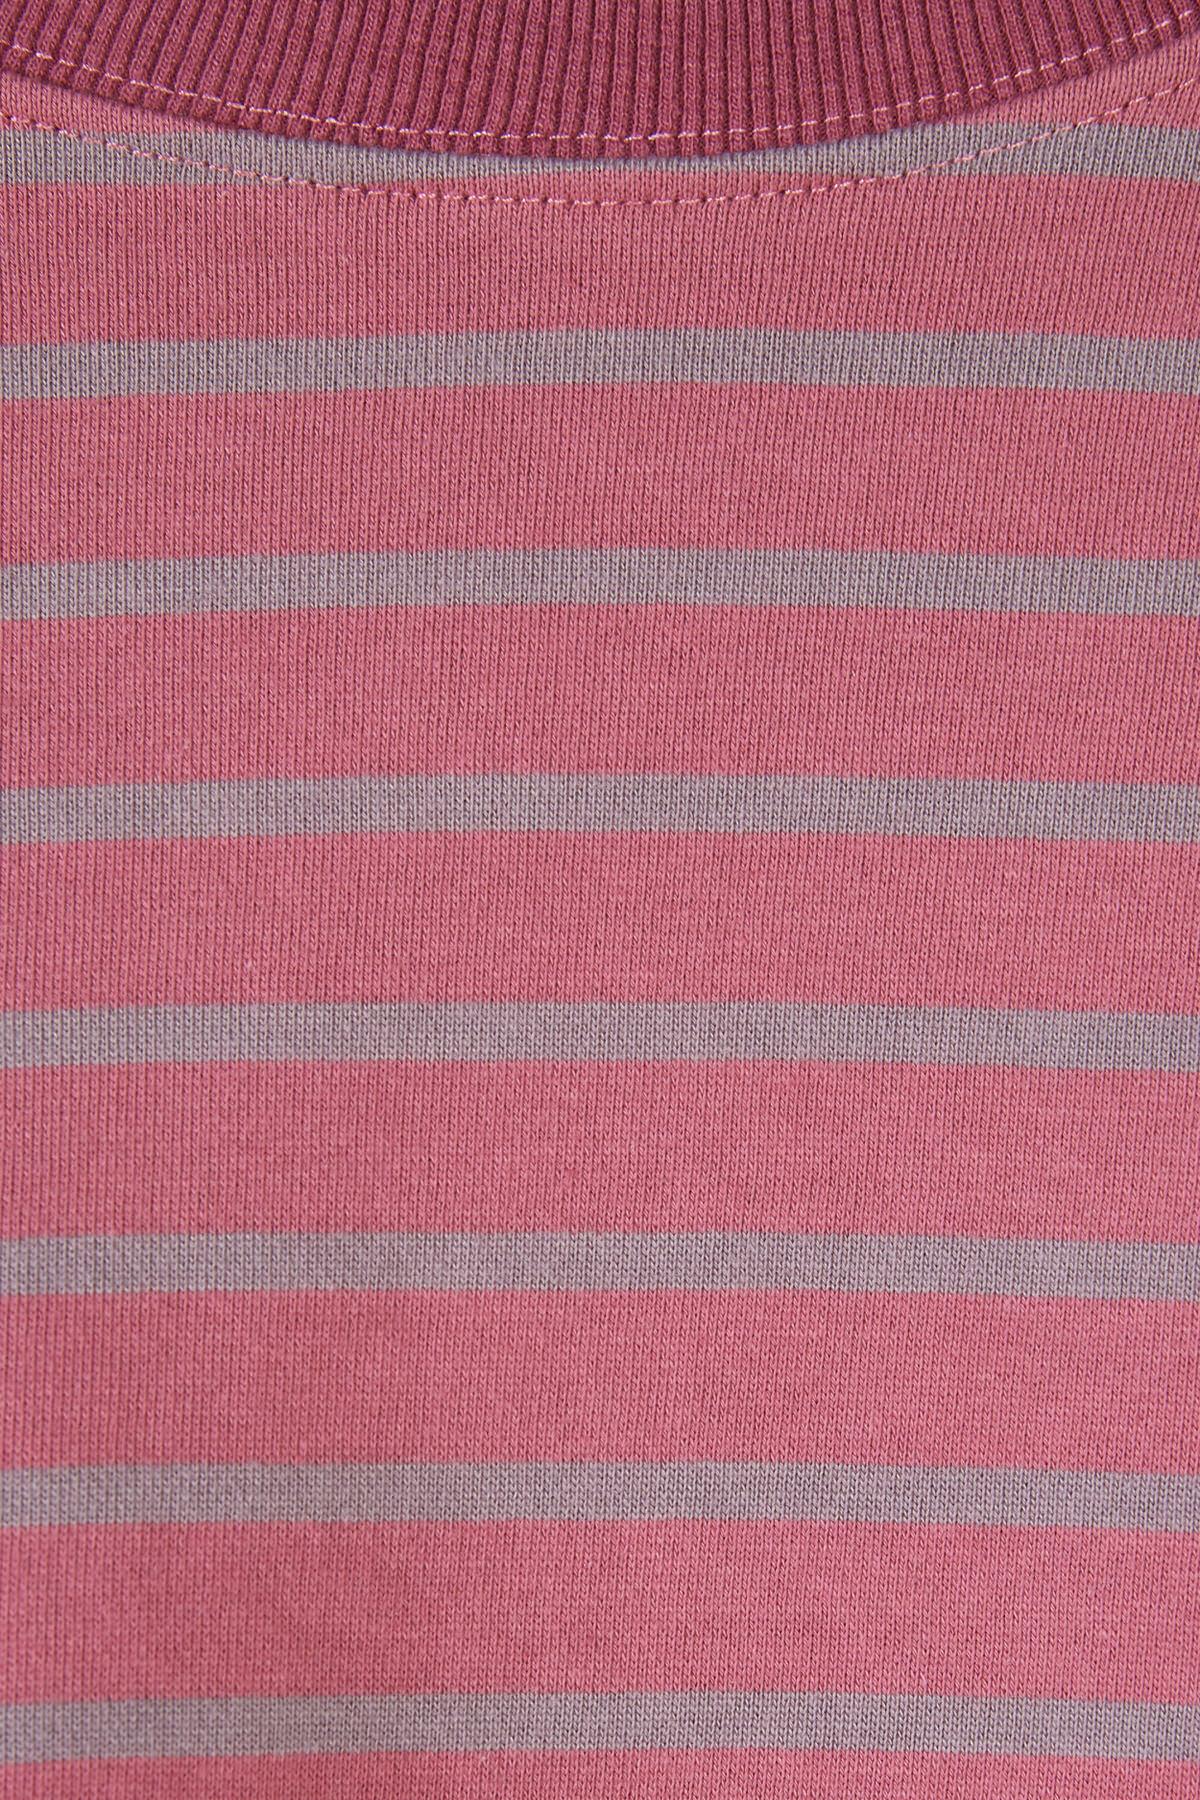 Sweatshirt J005 Pink 3